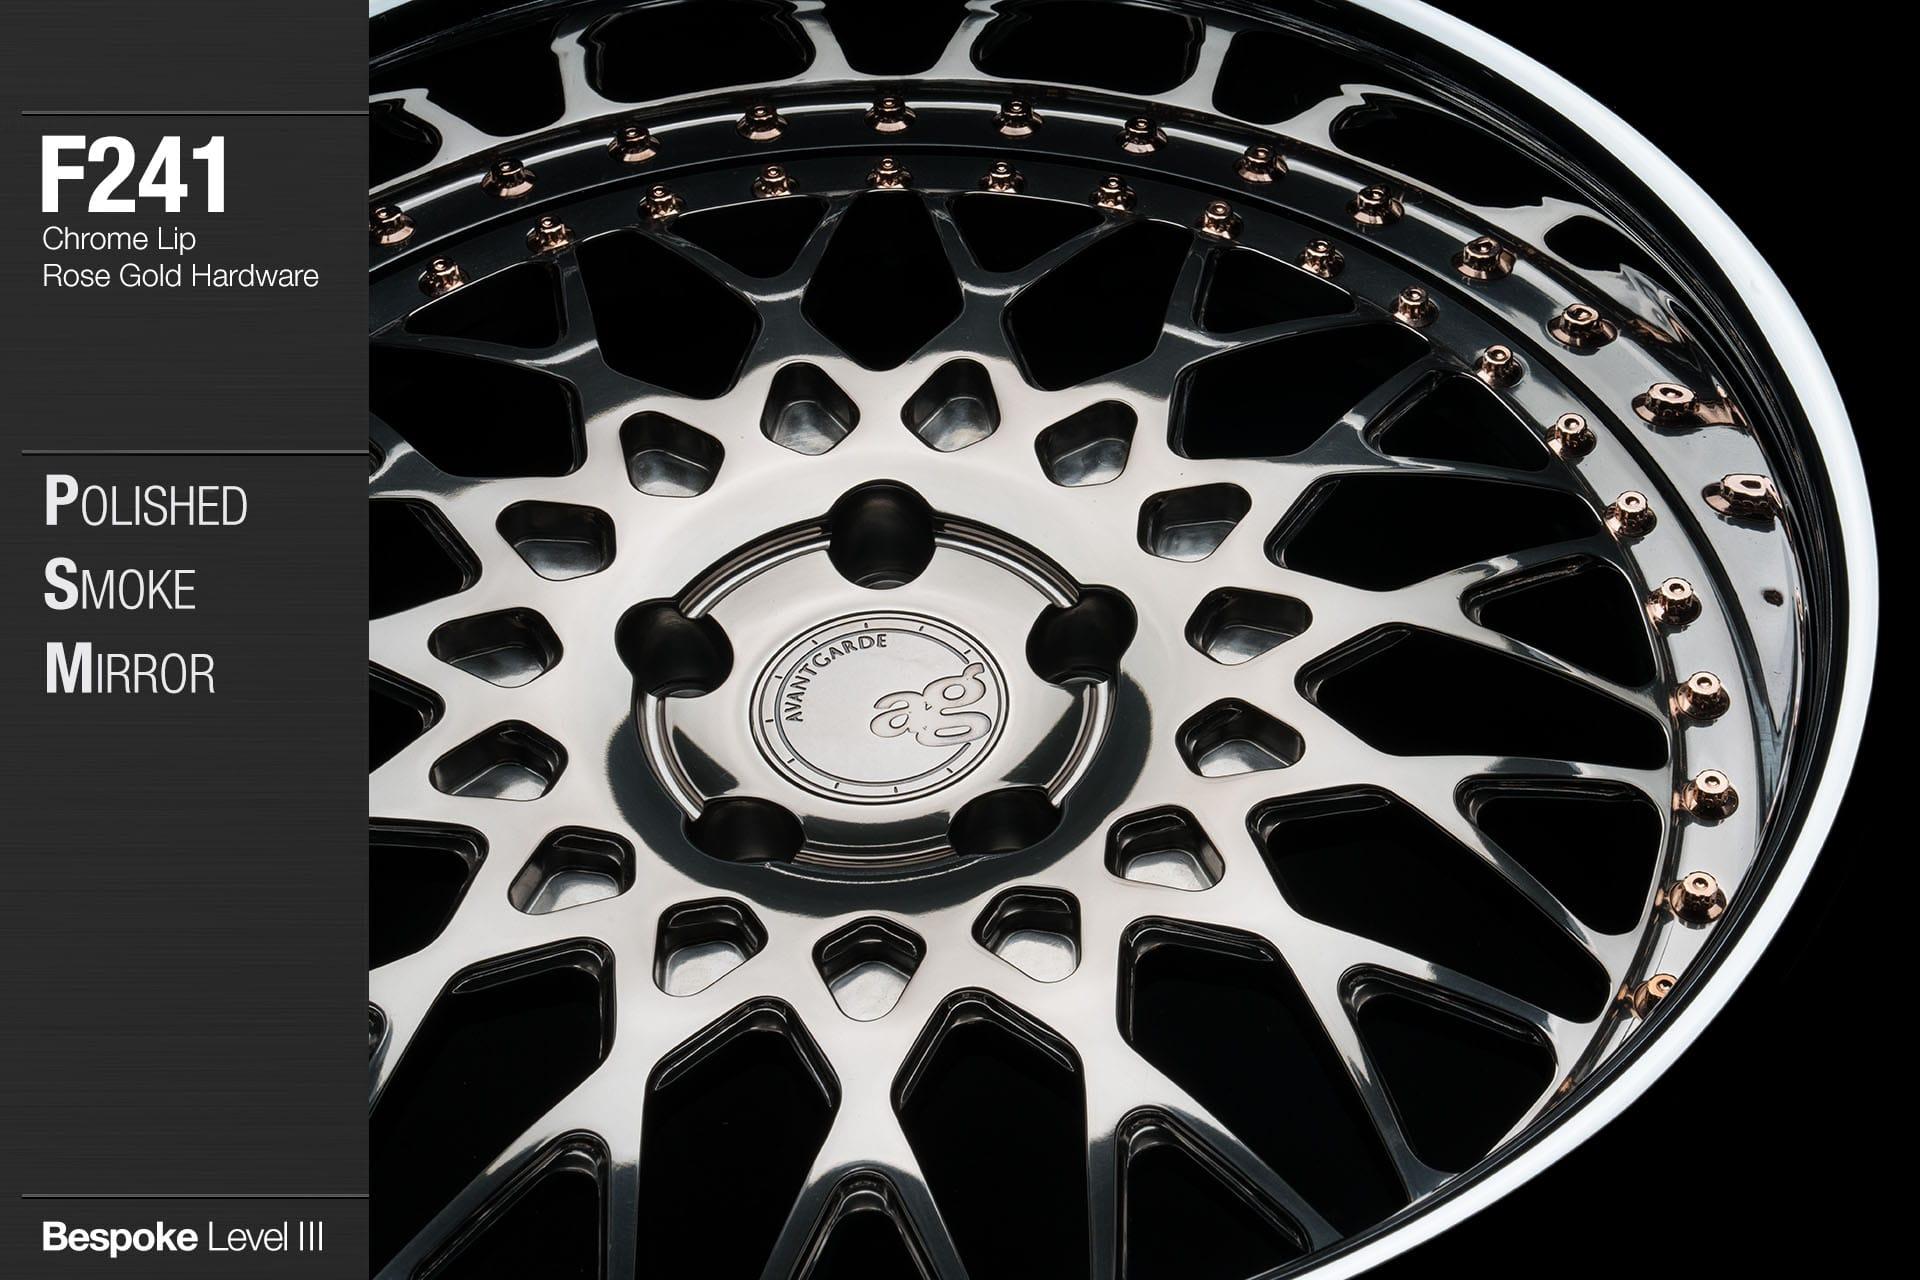 avant-garde-ag-wheels-f241-polished-smoke-mirror-face-chrome-lip-rose-gold-hardware-2-min